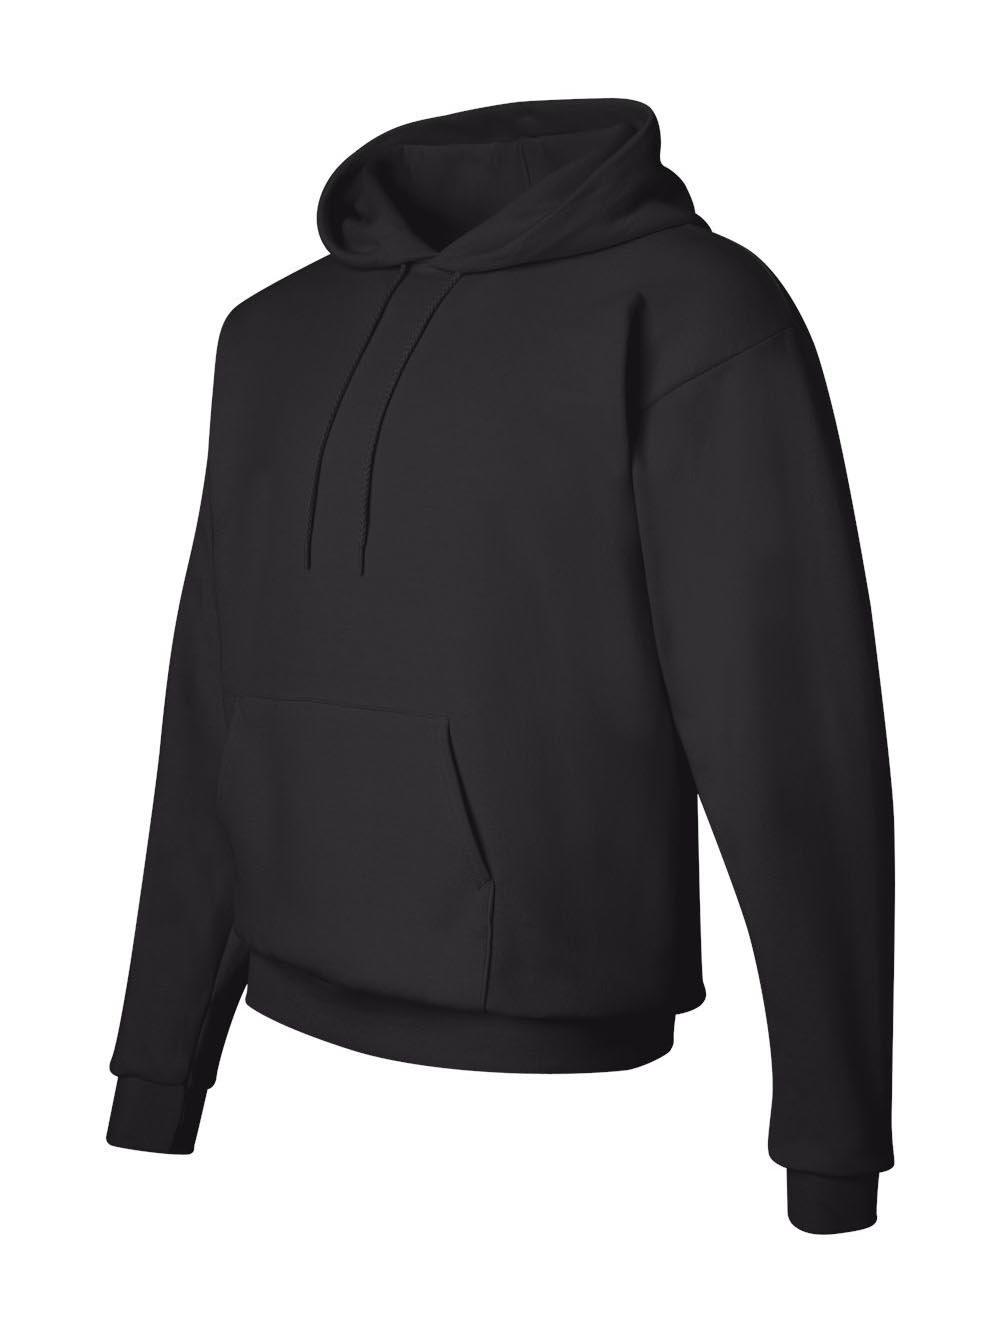 Hanes Men's Pullover EcoSmart Fleece Hoodie, Black, X-Large by Hanes (Image #3)